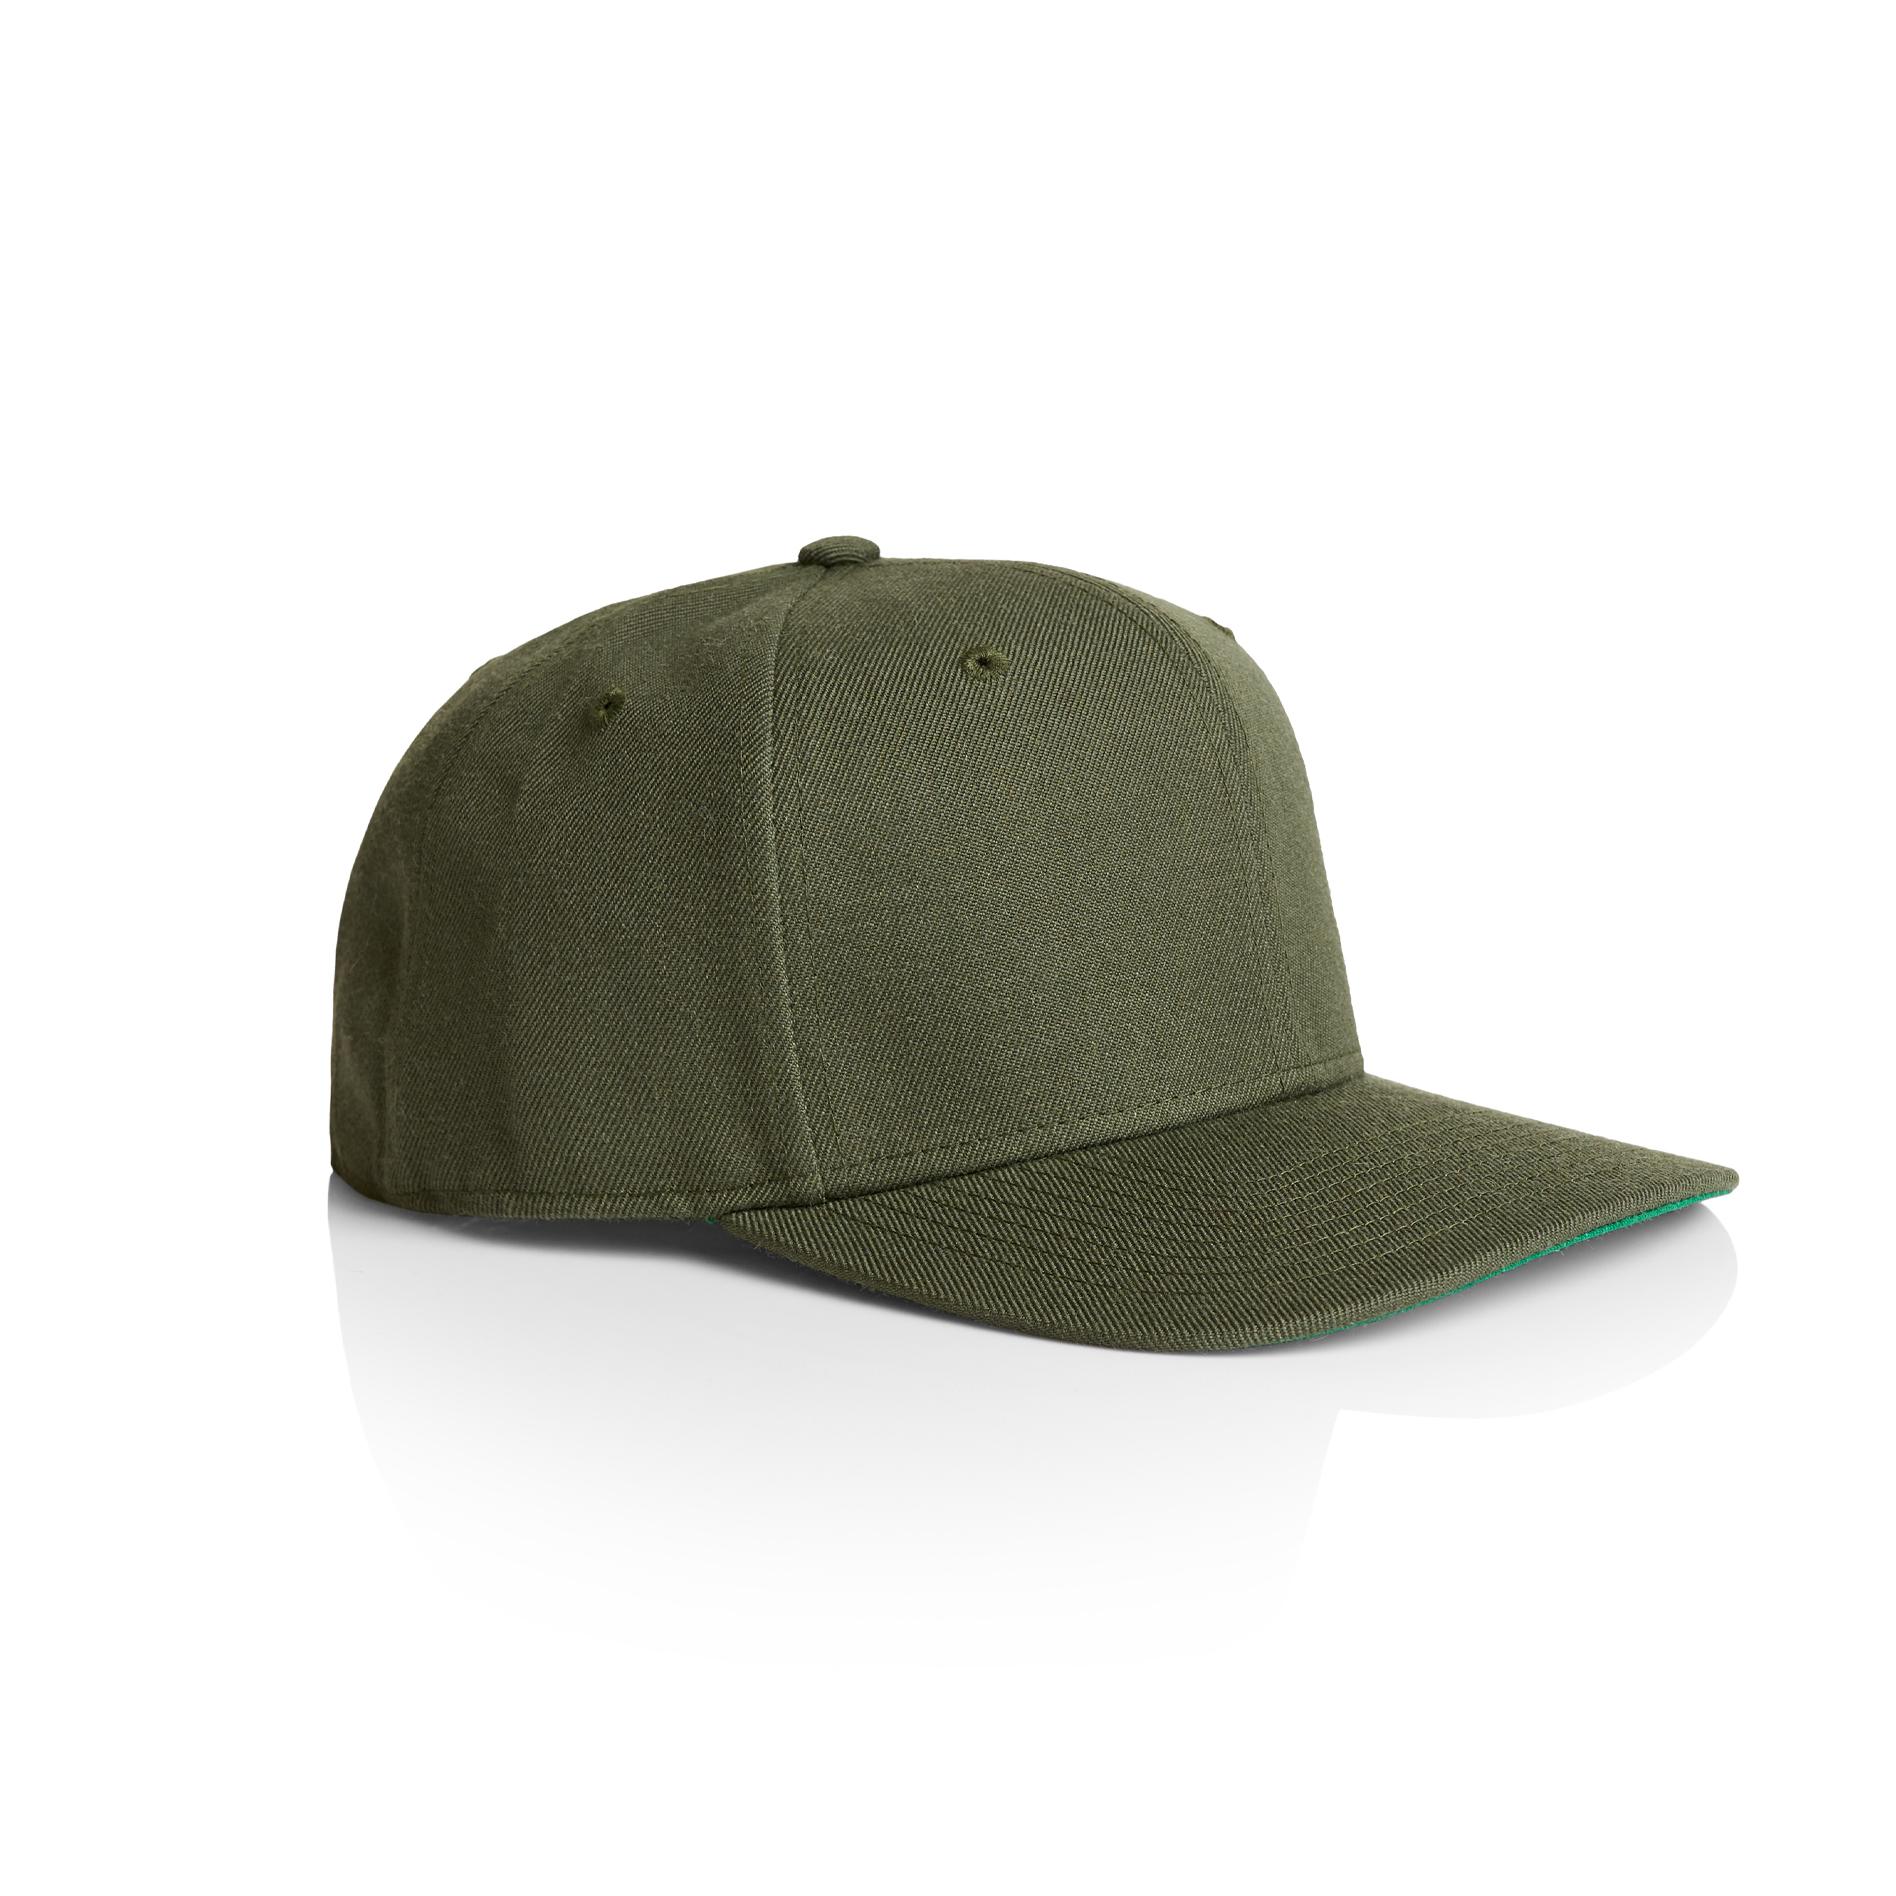 1101 TRIM SNAPBACK CAP